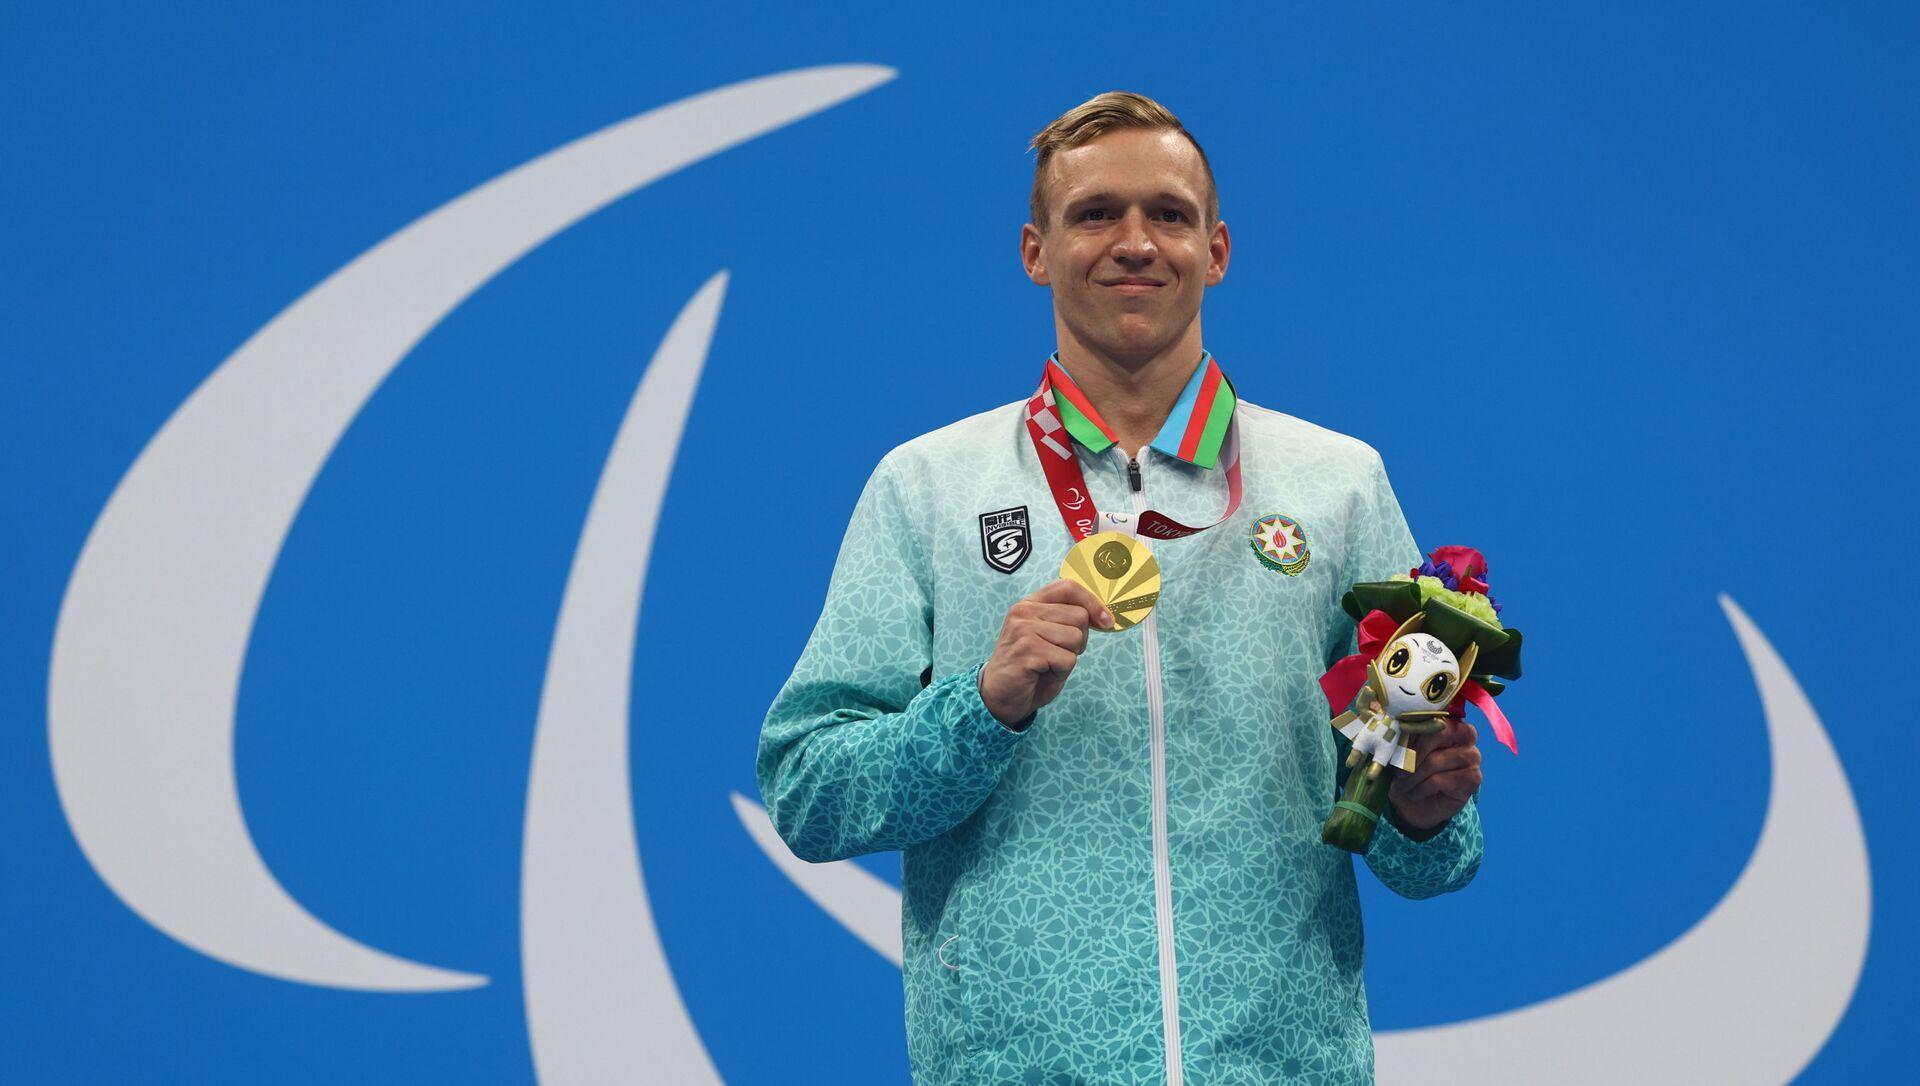 Азербайджанский пловец Роман Салех на церемонии награждения Паралимпийских игр Токио-2020 - Sputnik Azərbaycan, 1920, 28.08.2021